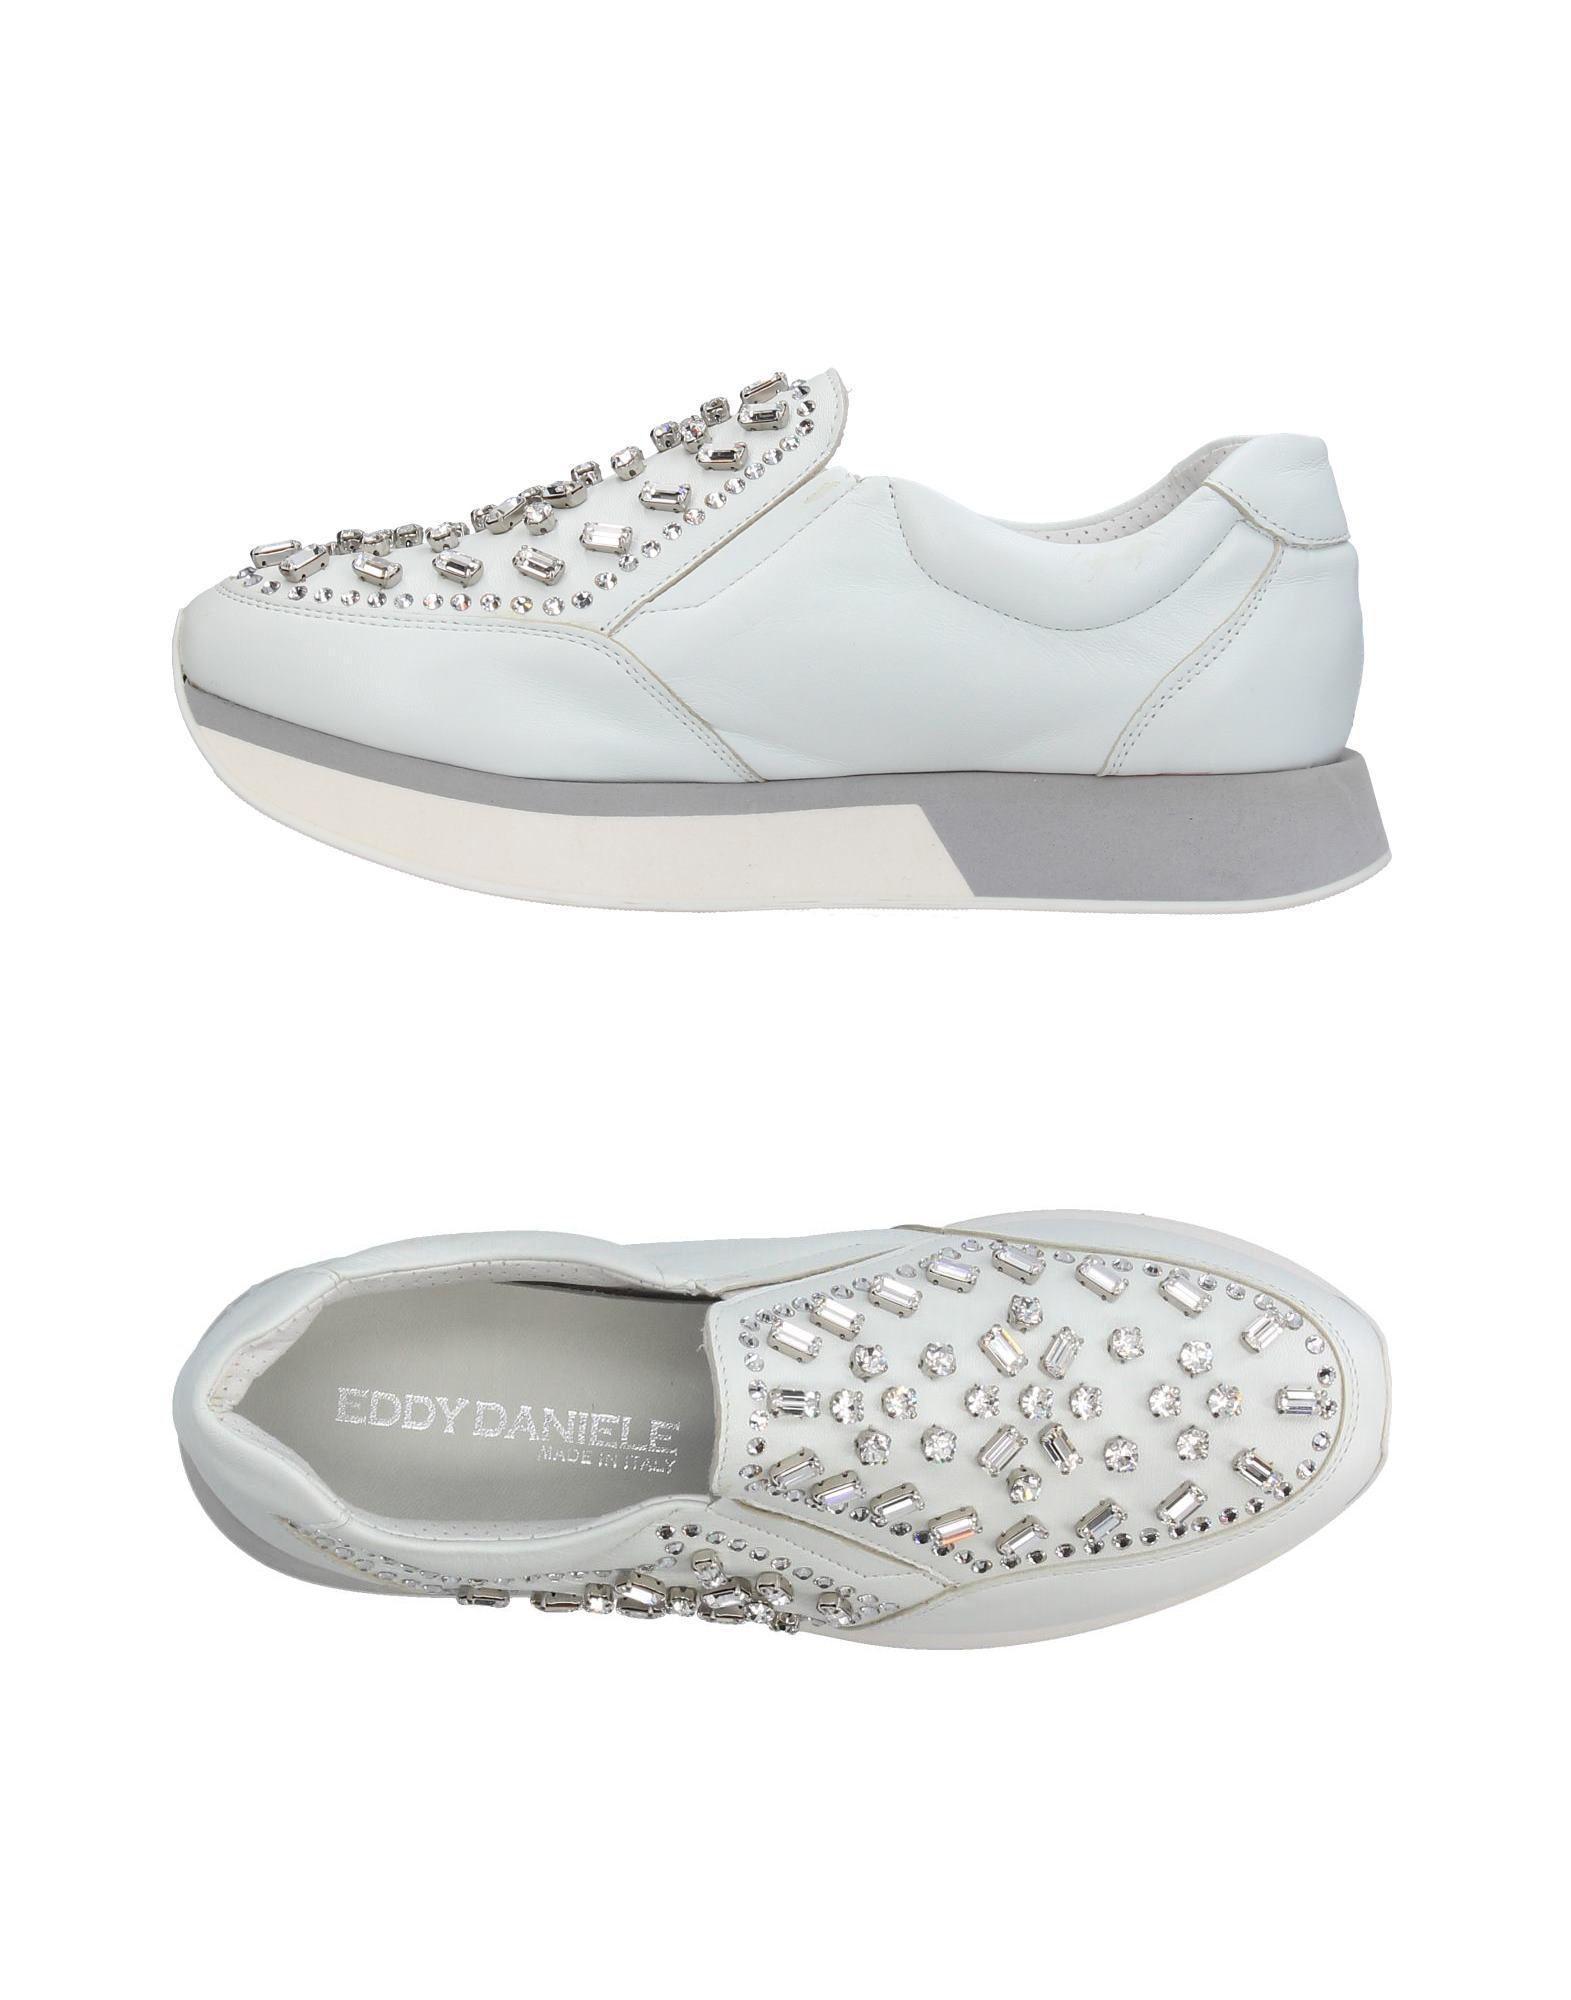 FOOTWEAR - Low-tops & sneakers Eddy Daniele Discount Fashion Style tQS4XQ2D